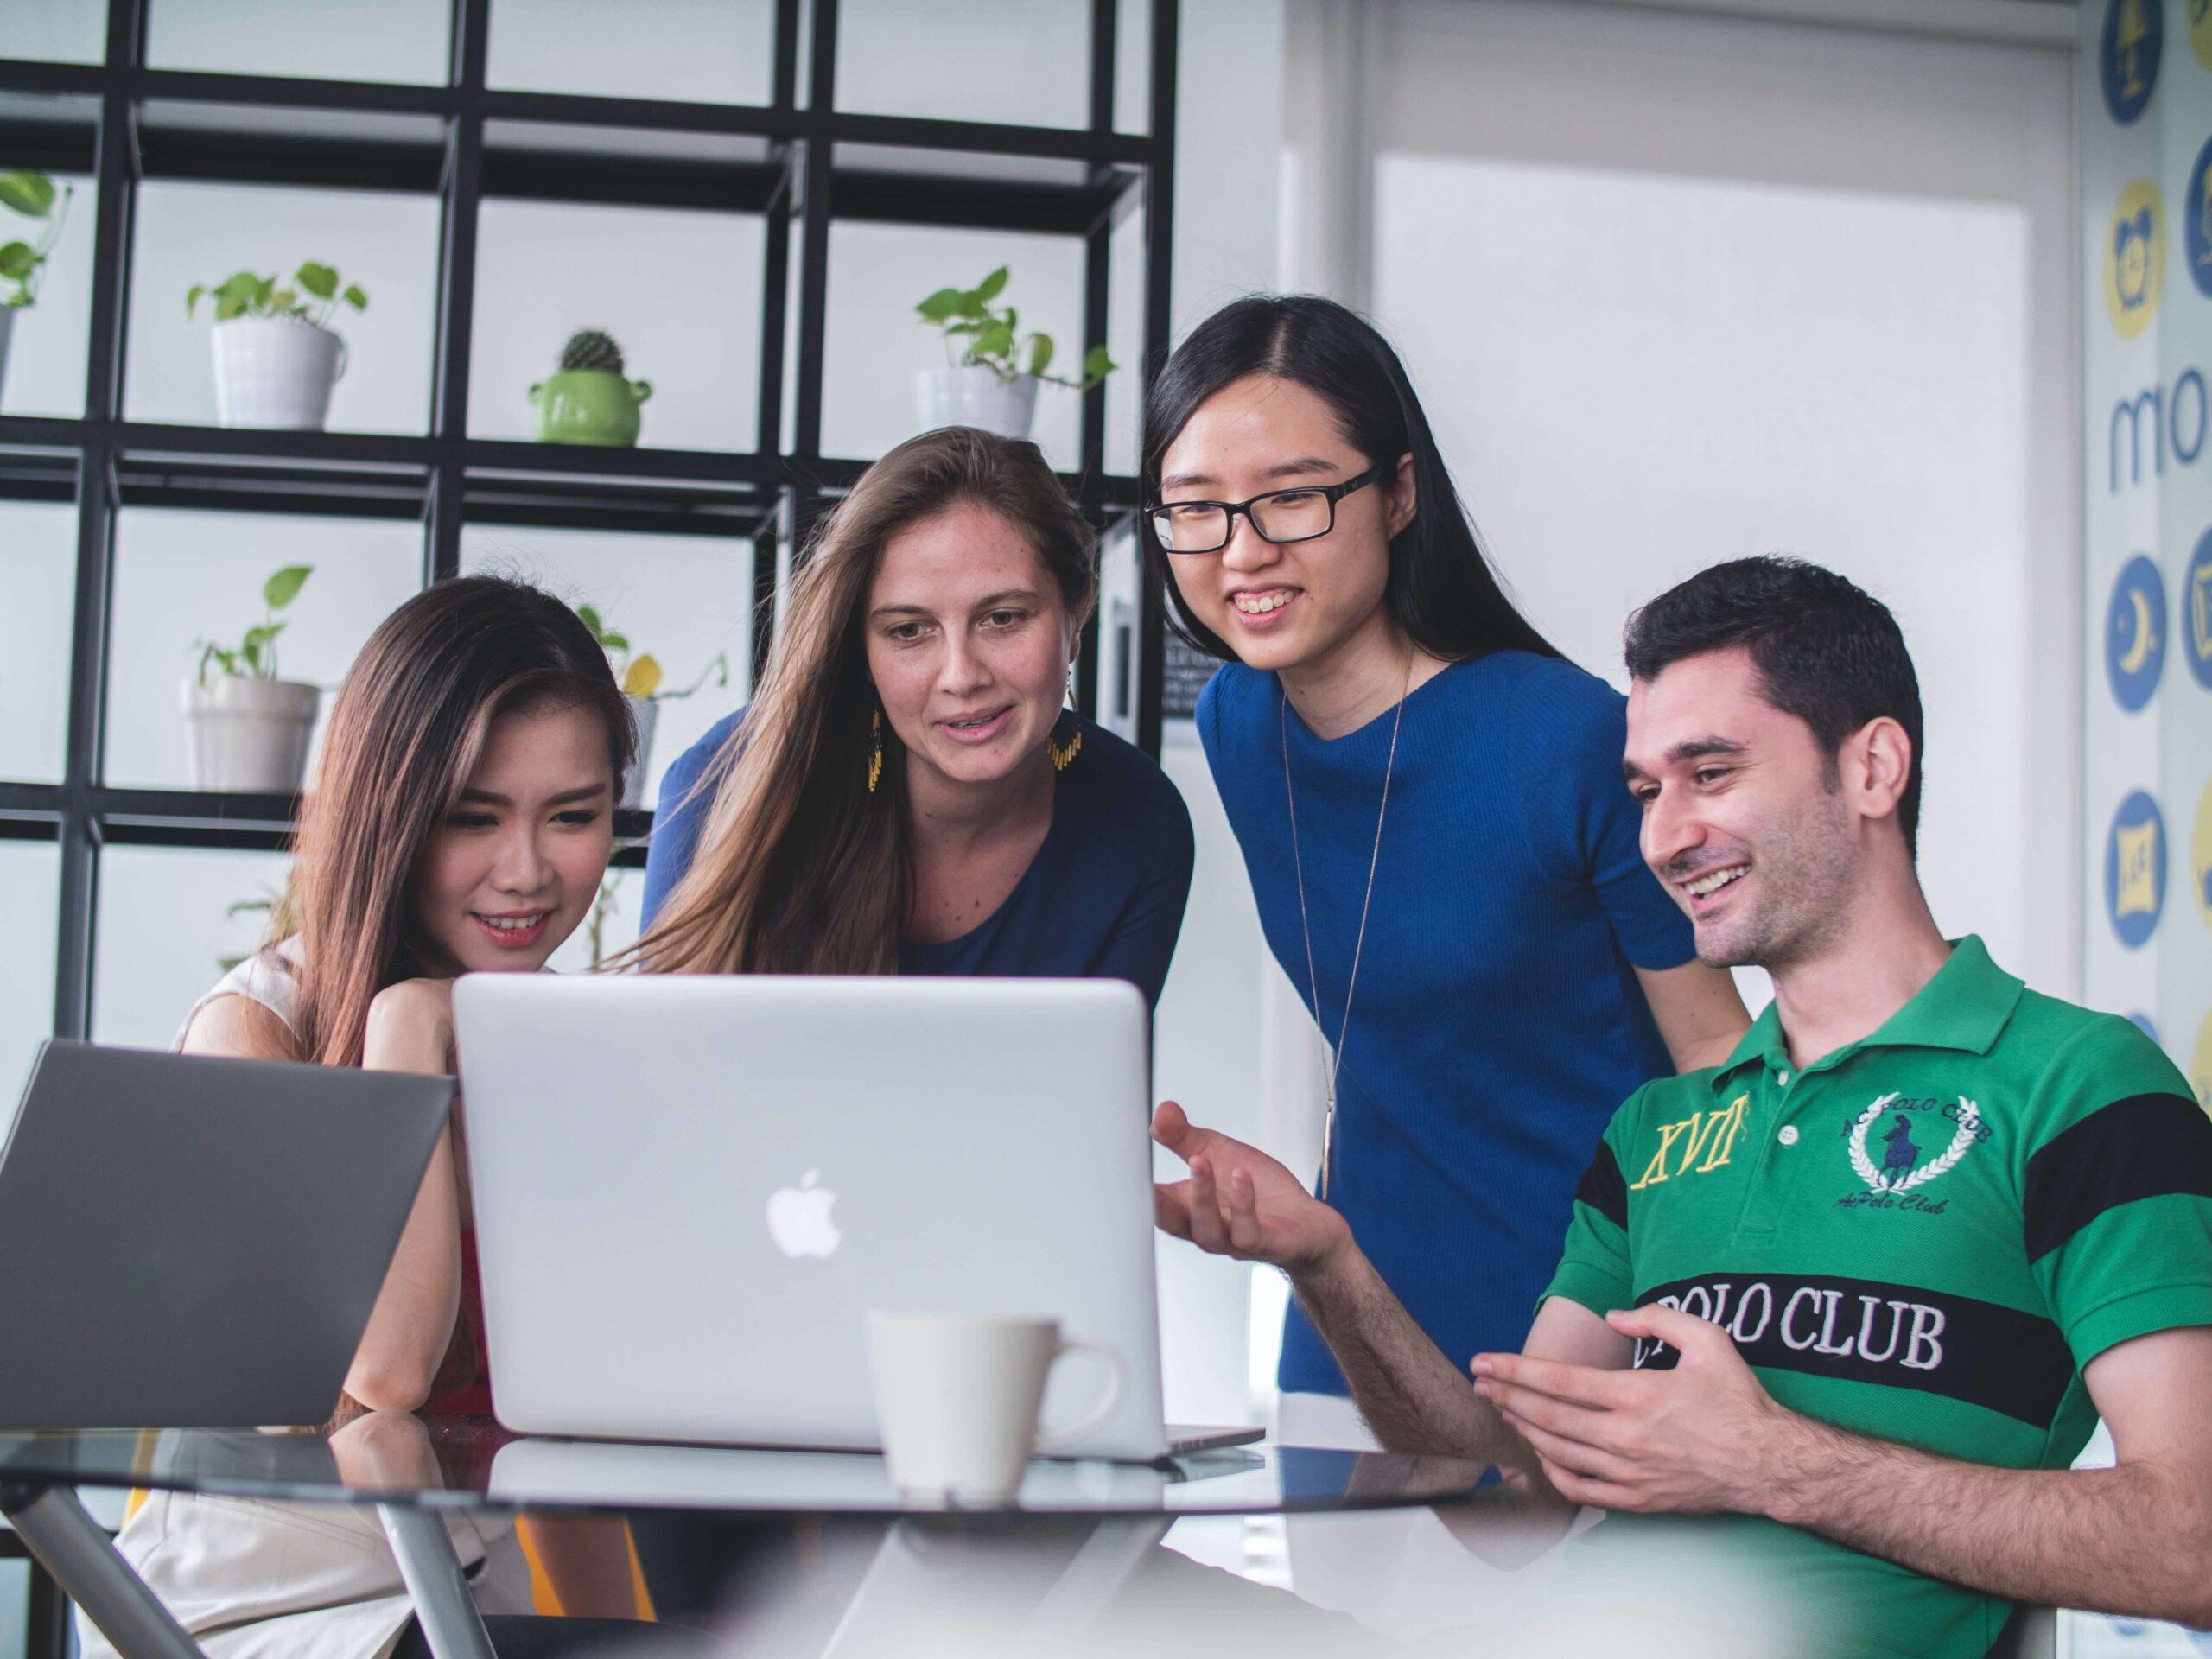 Grupa osób realizuje angażujący kurs e-learningowy